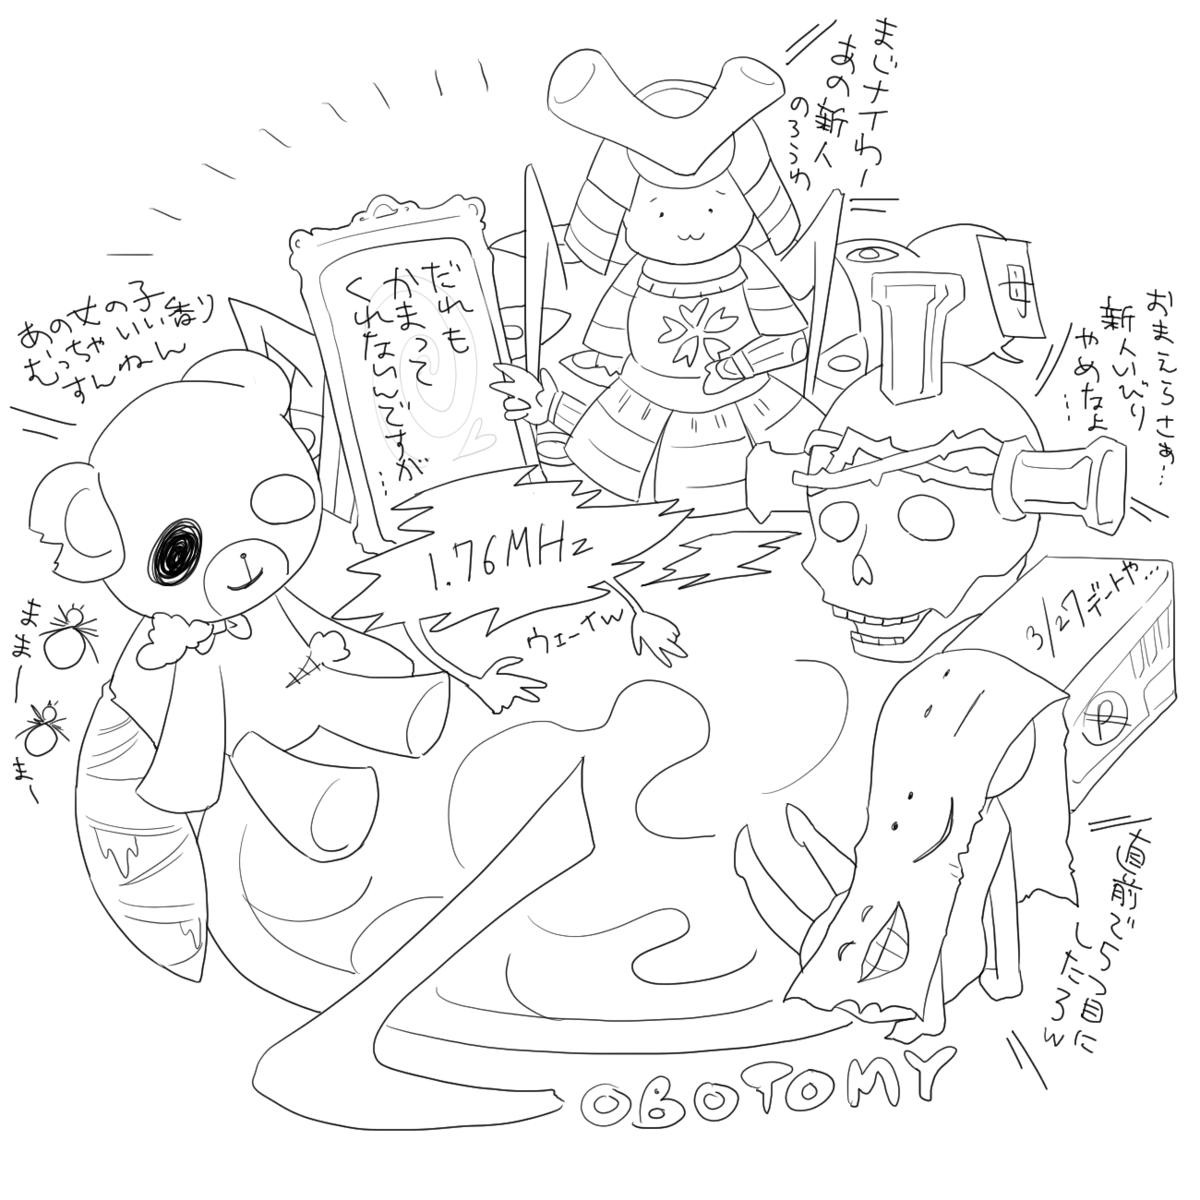 f:id:nantekotodesyoune_segawa:20190421231837p:plain